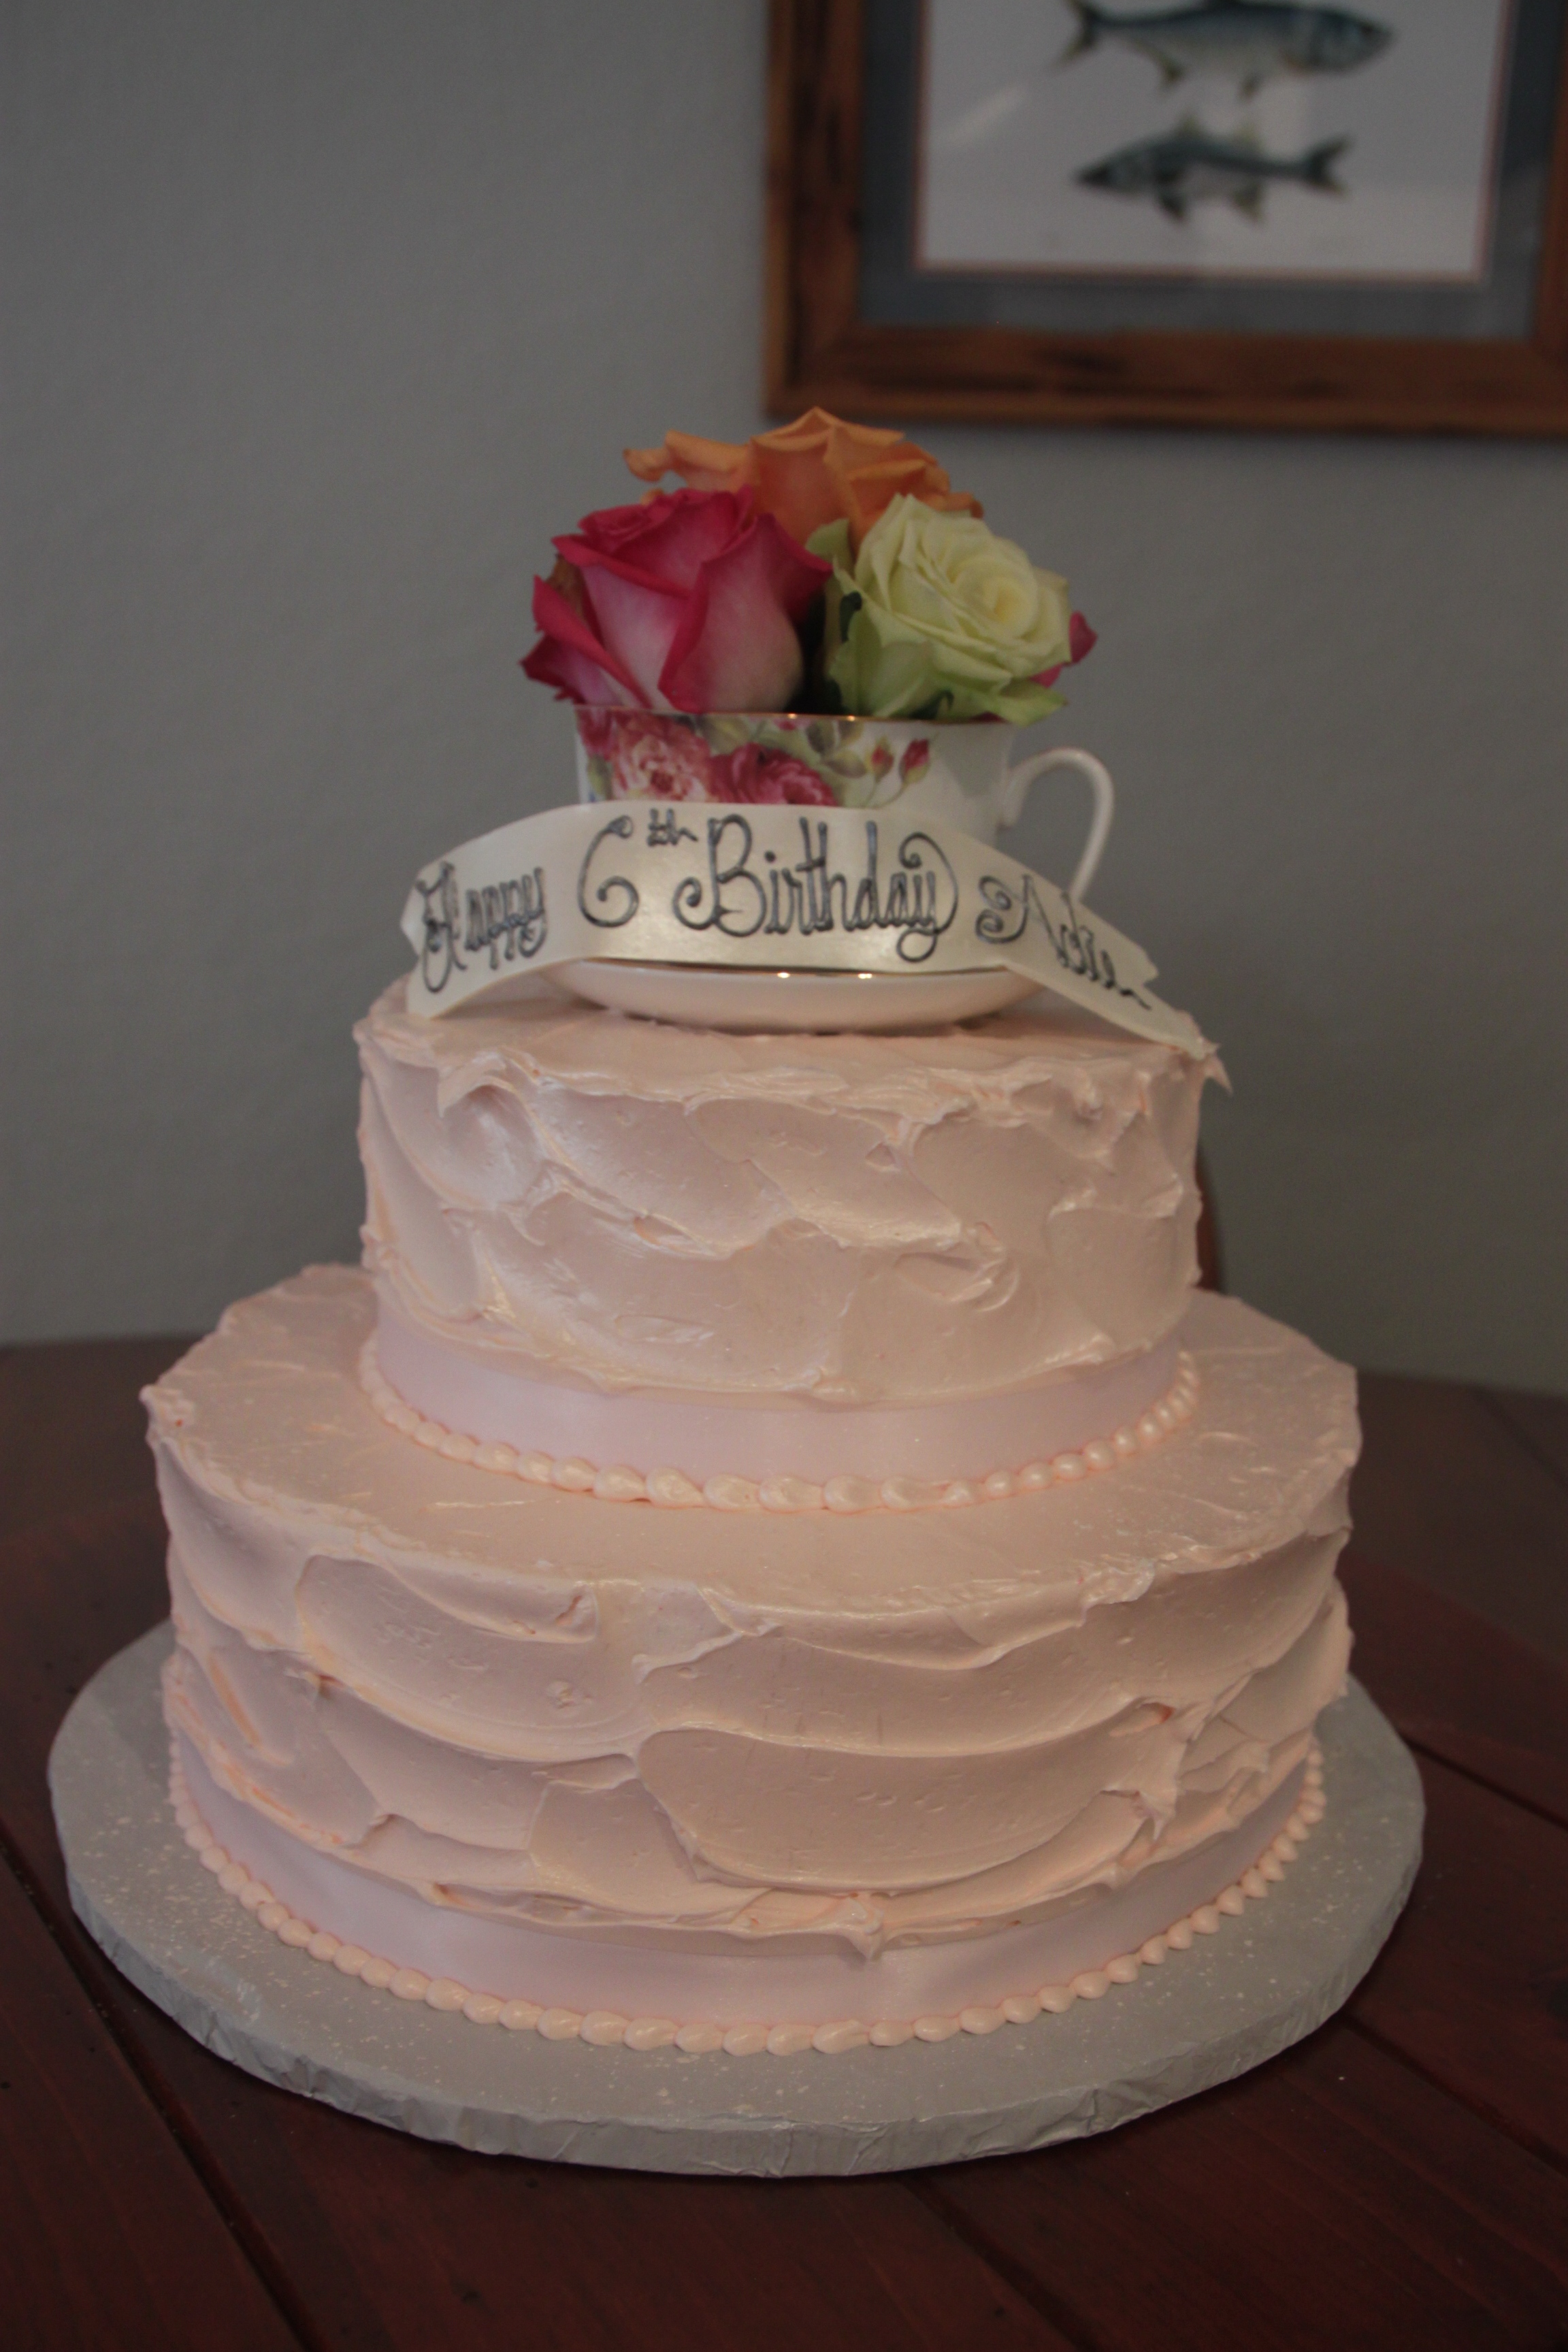 Cake by Mikkelsens